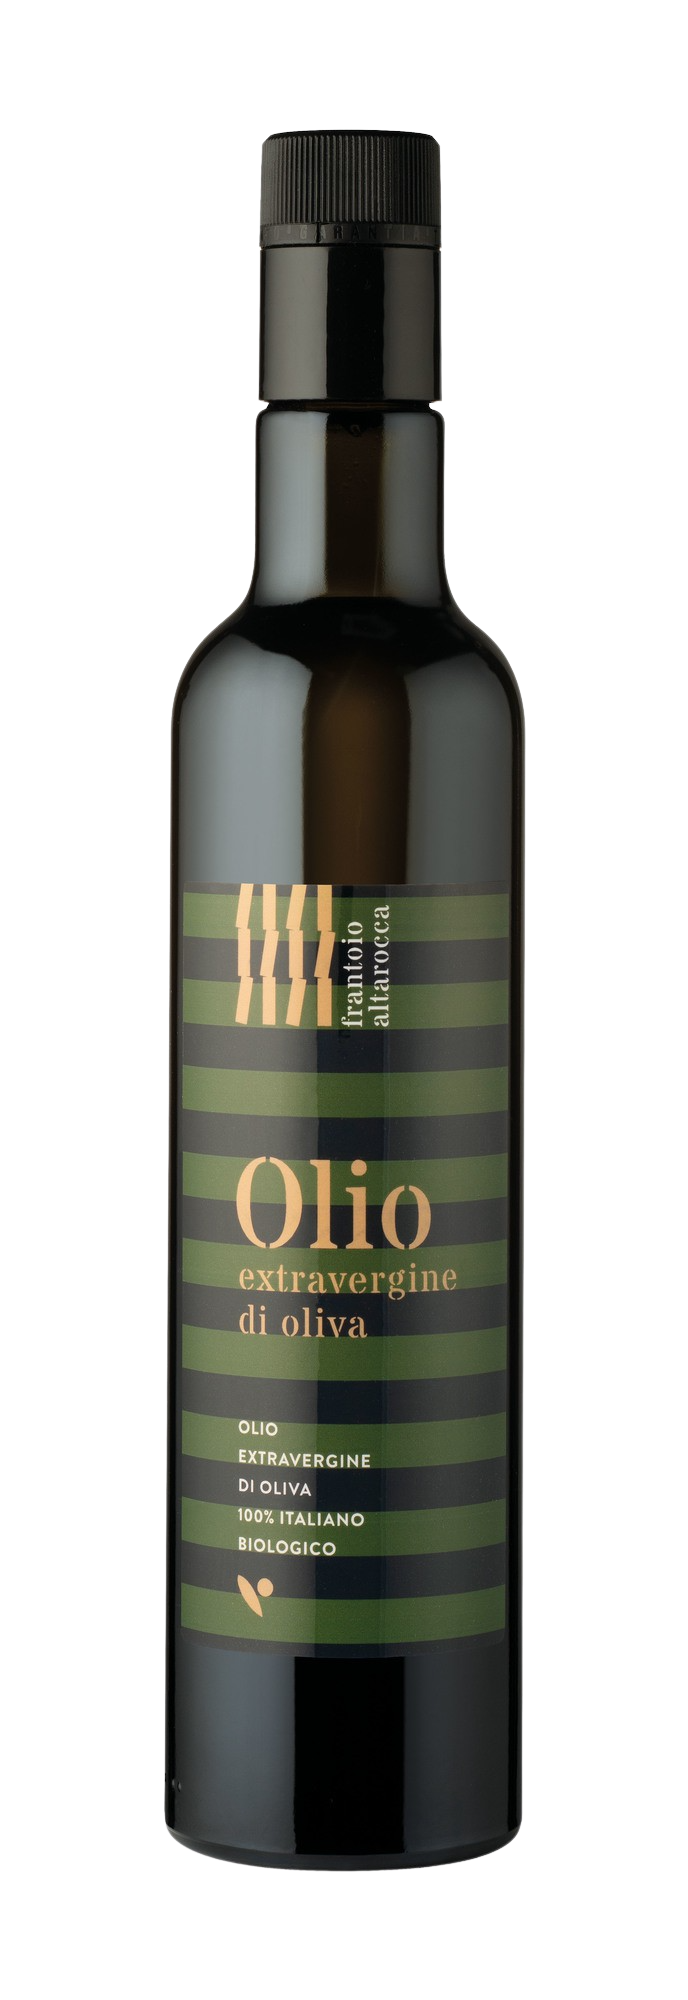 Olio-extravergine-oliva-biologico-altarocca-removebg